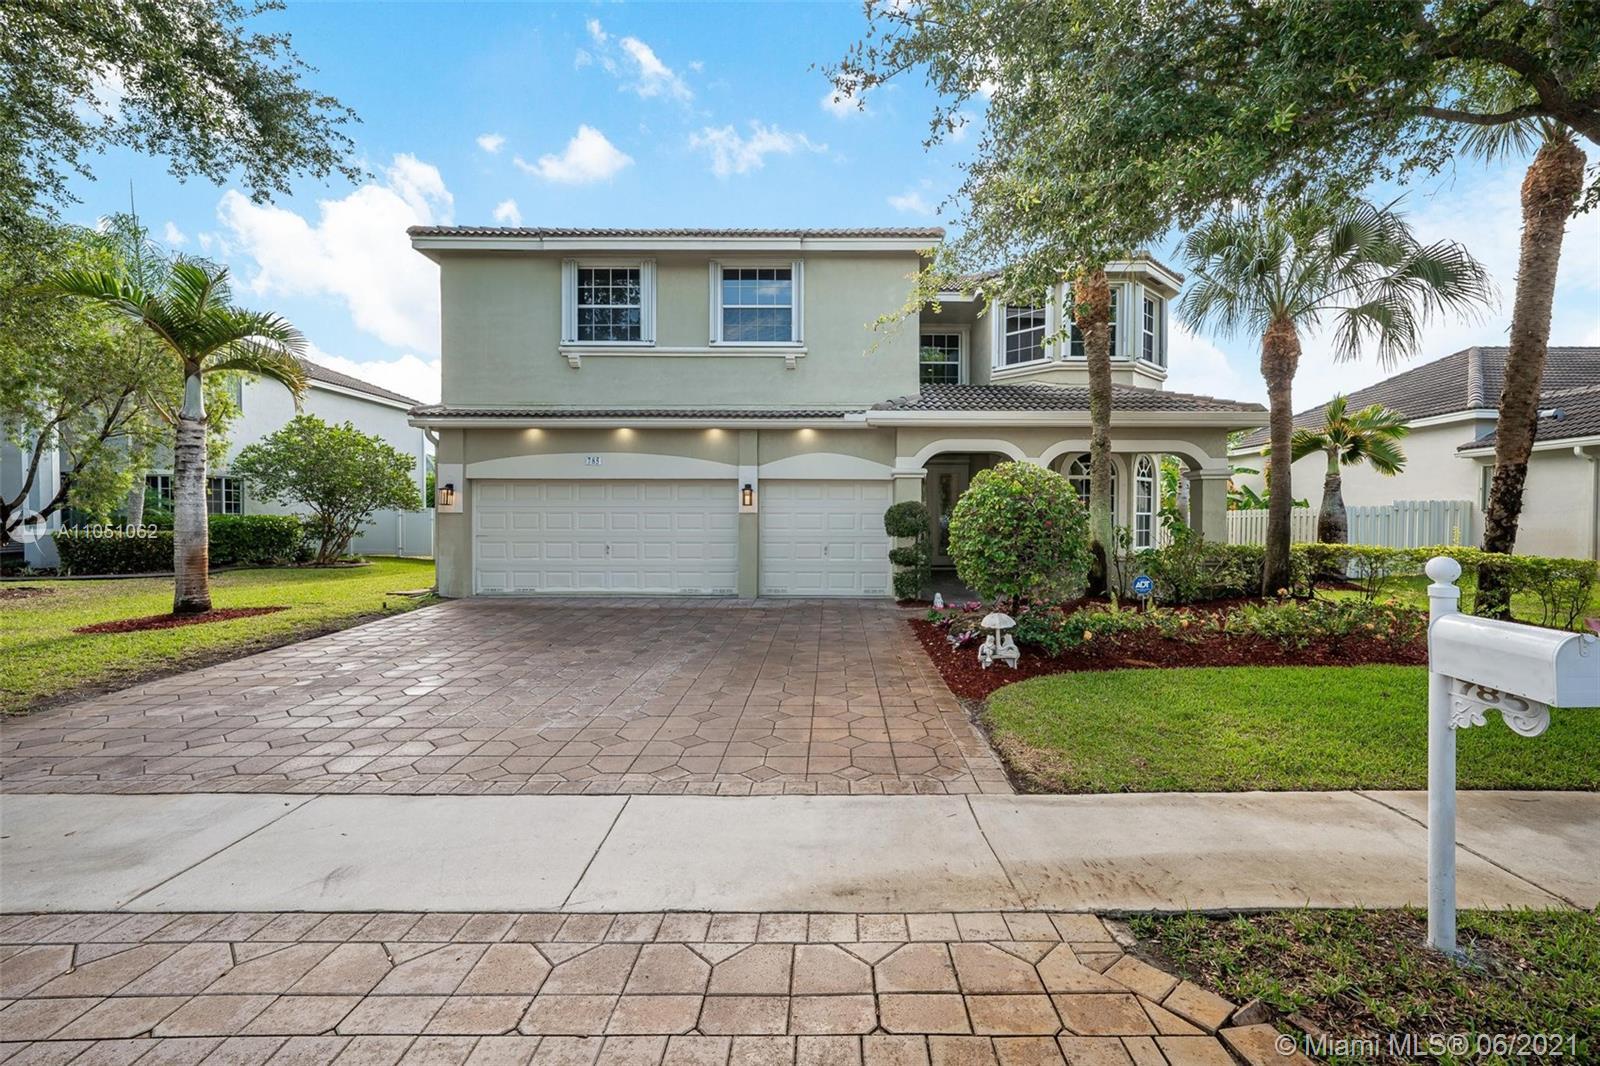 The Estates of Pembroke Shores - 785 SW 159th Ln, Pembroke Pines, FL 33027